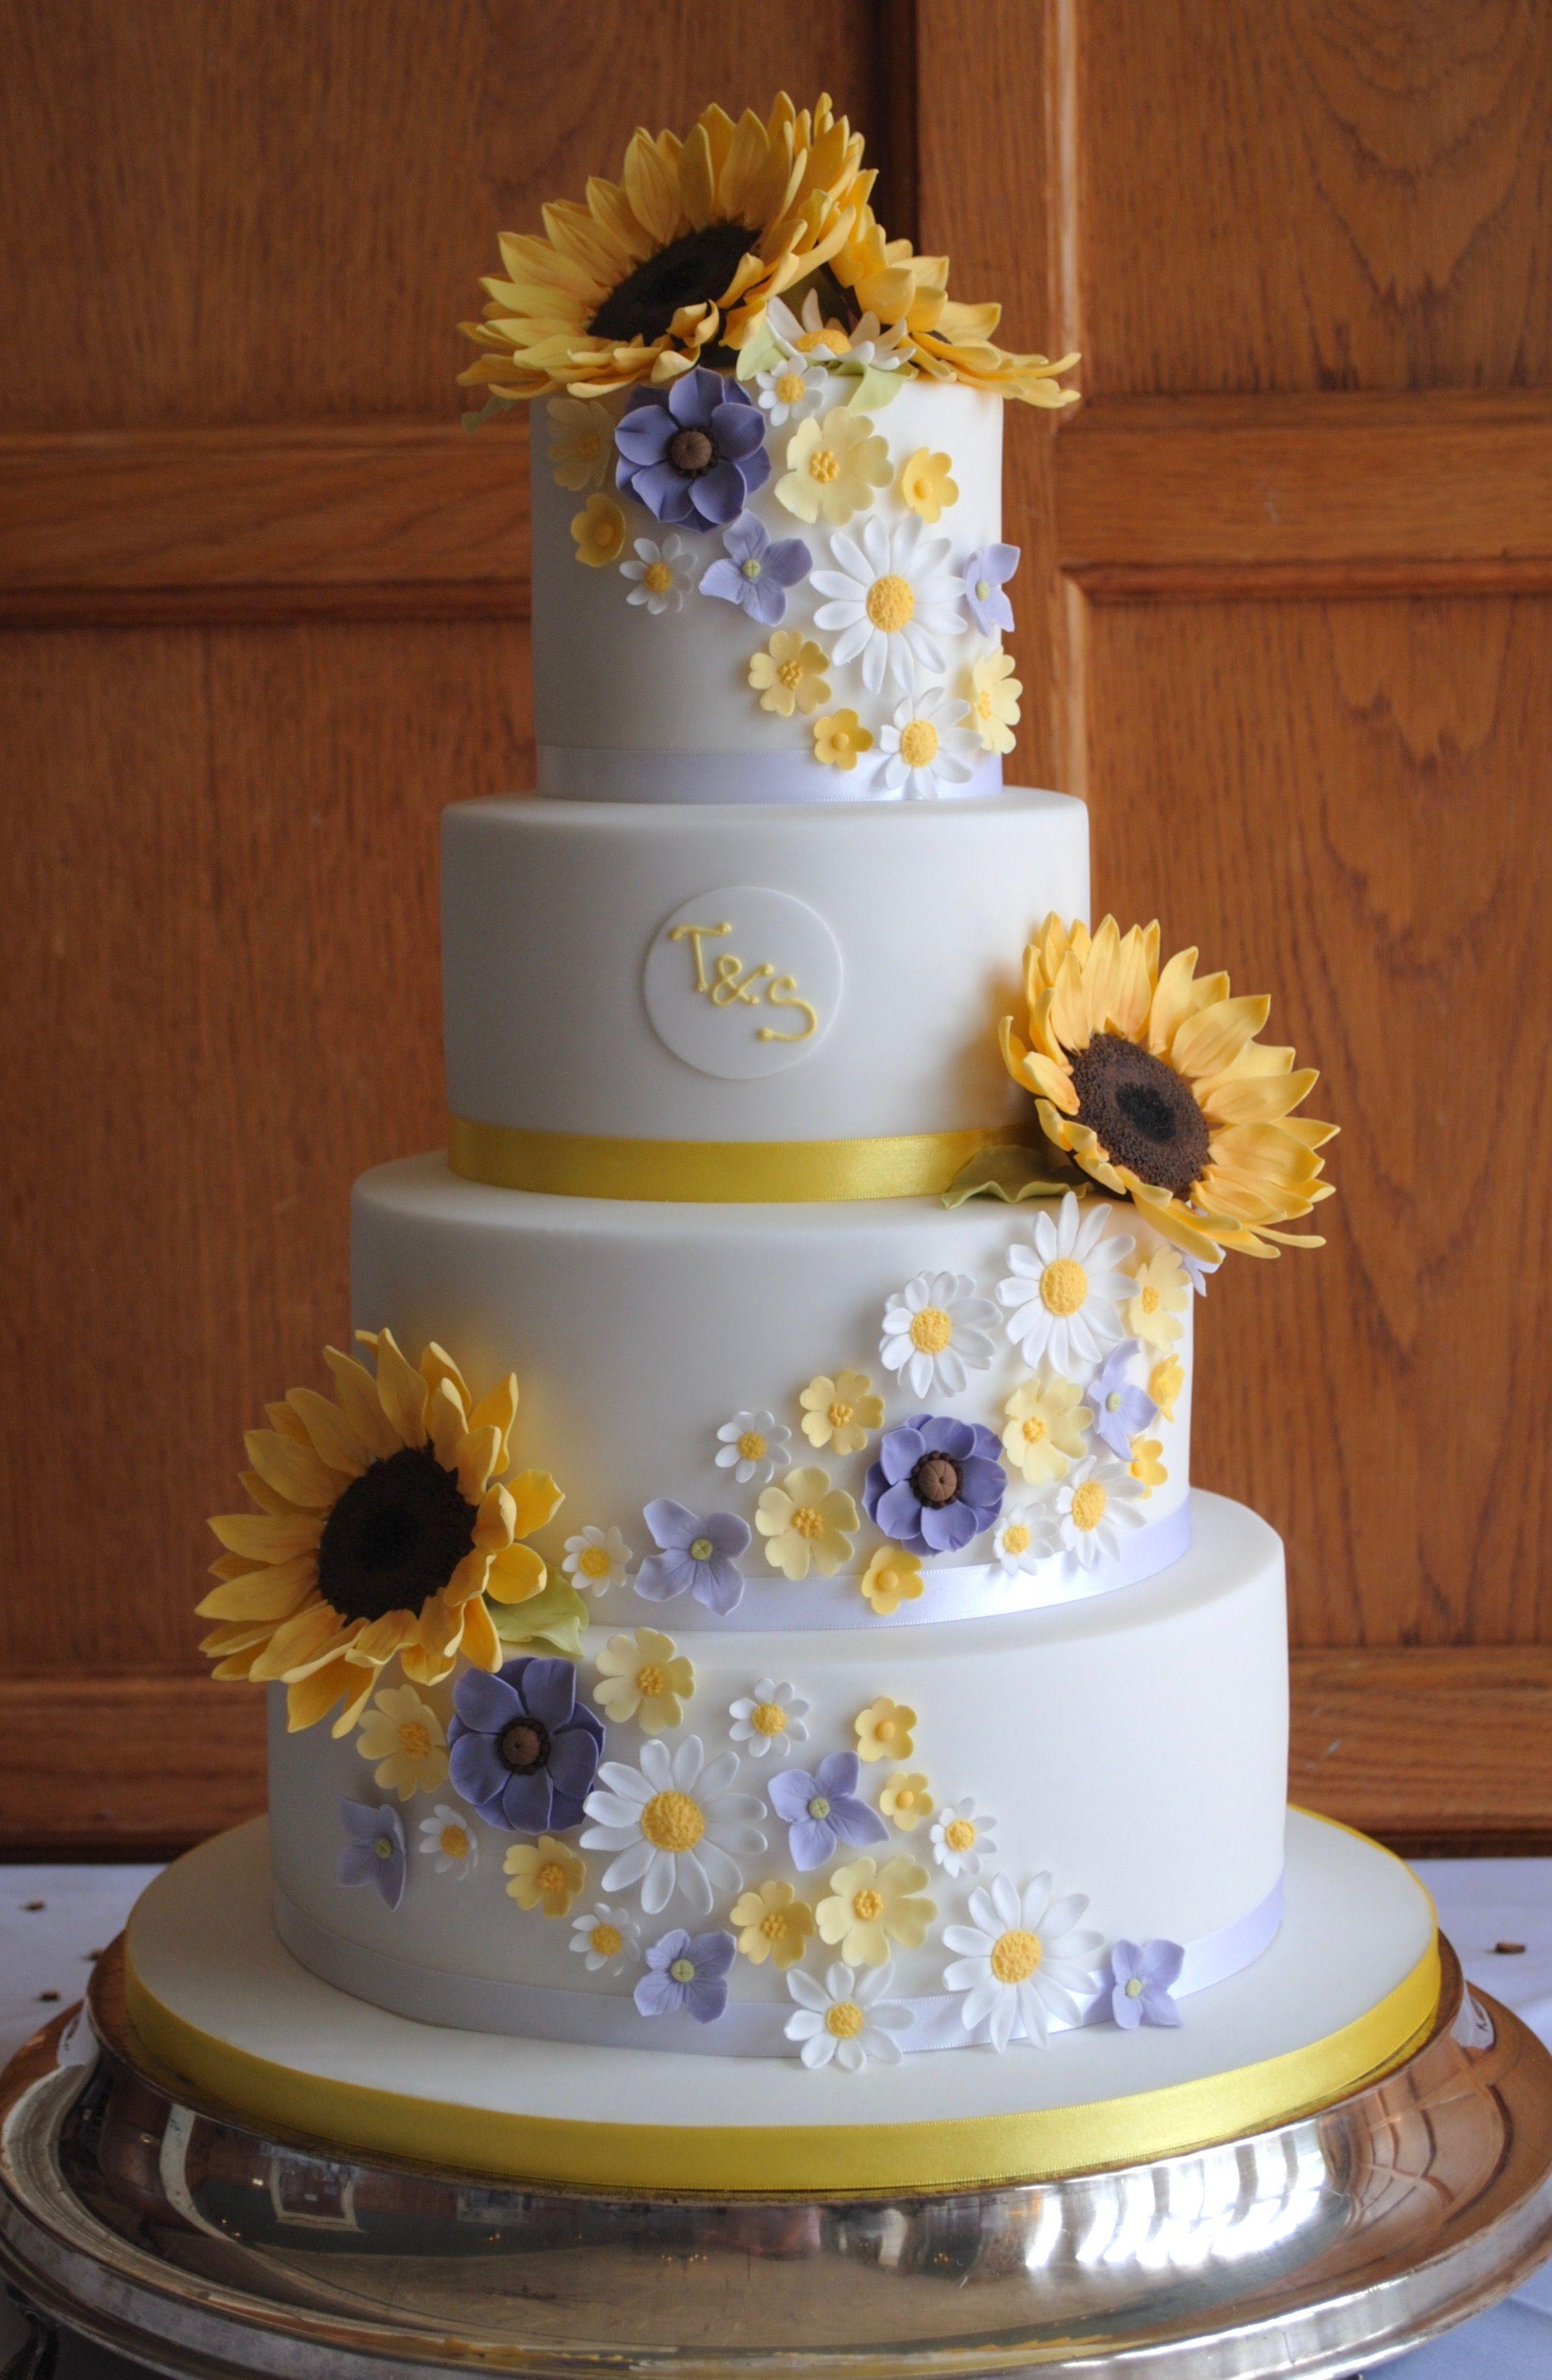 Sunflowers wedding cake from www.tortebella.co.uk